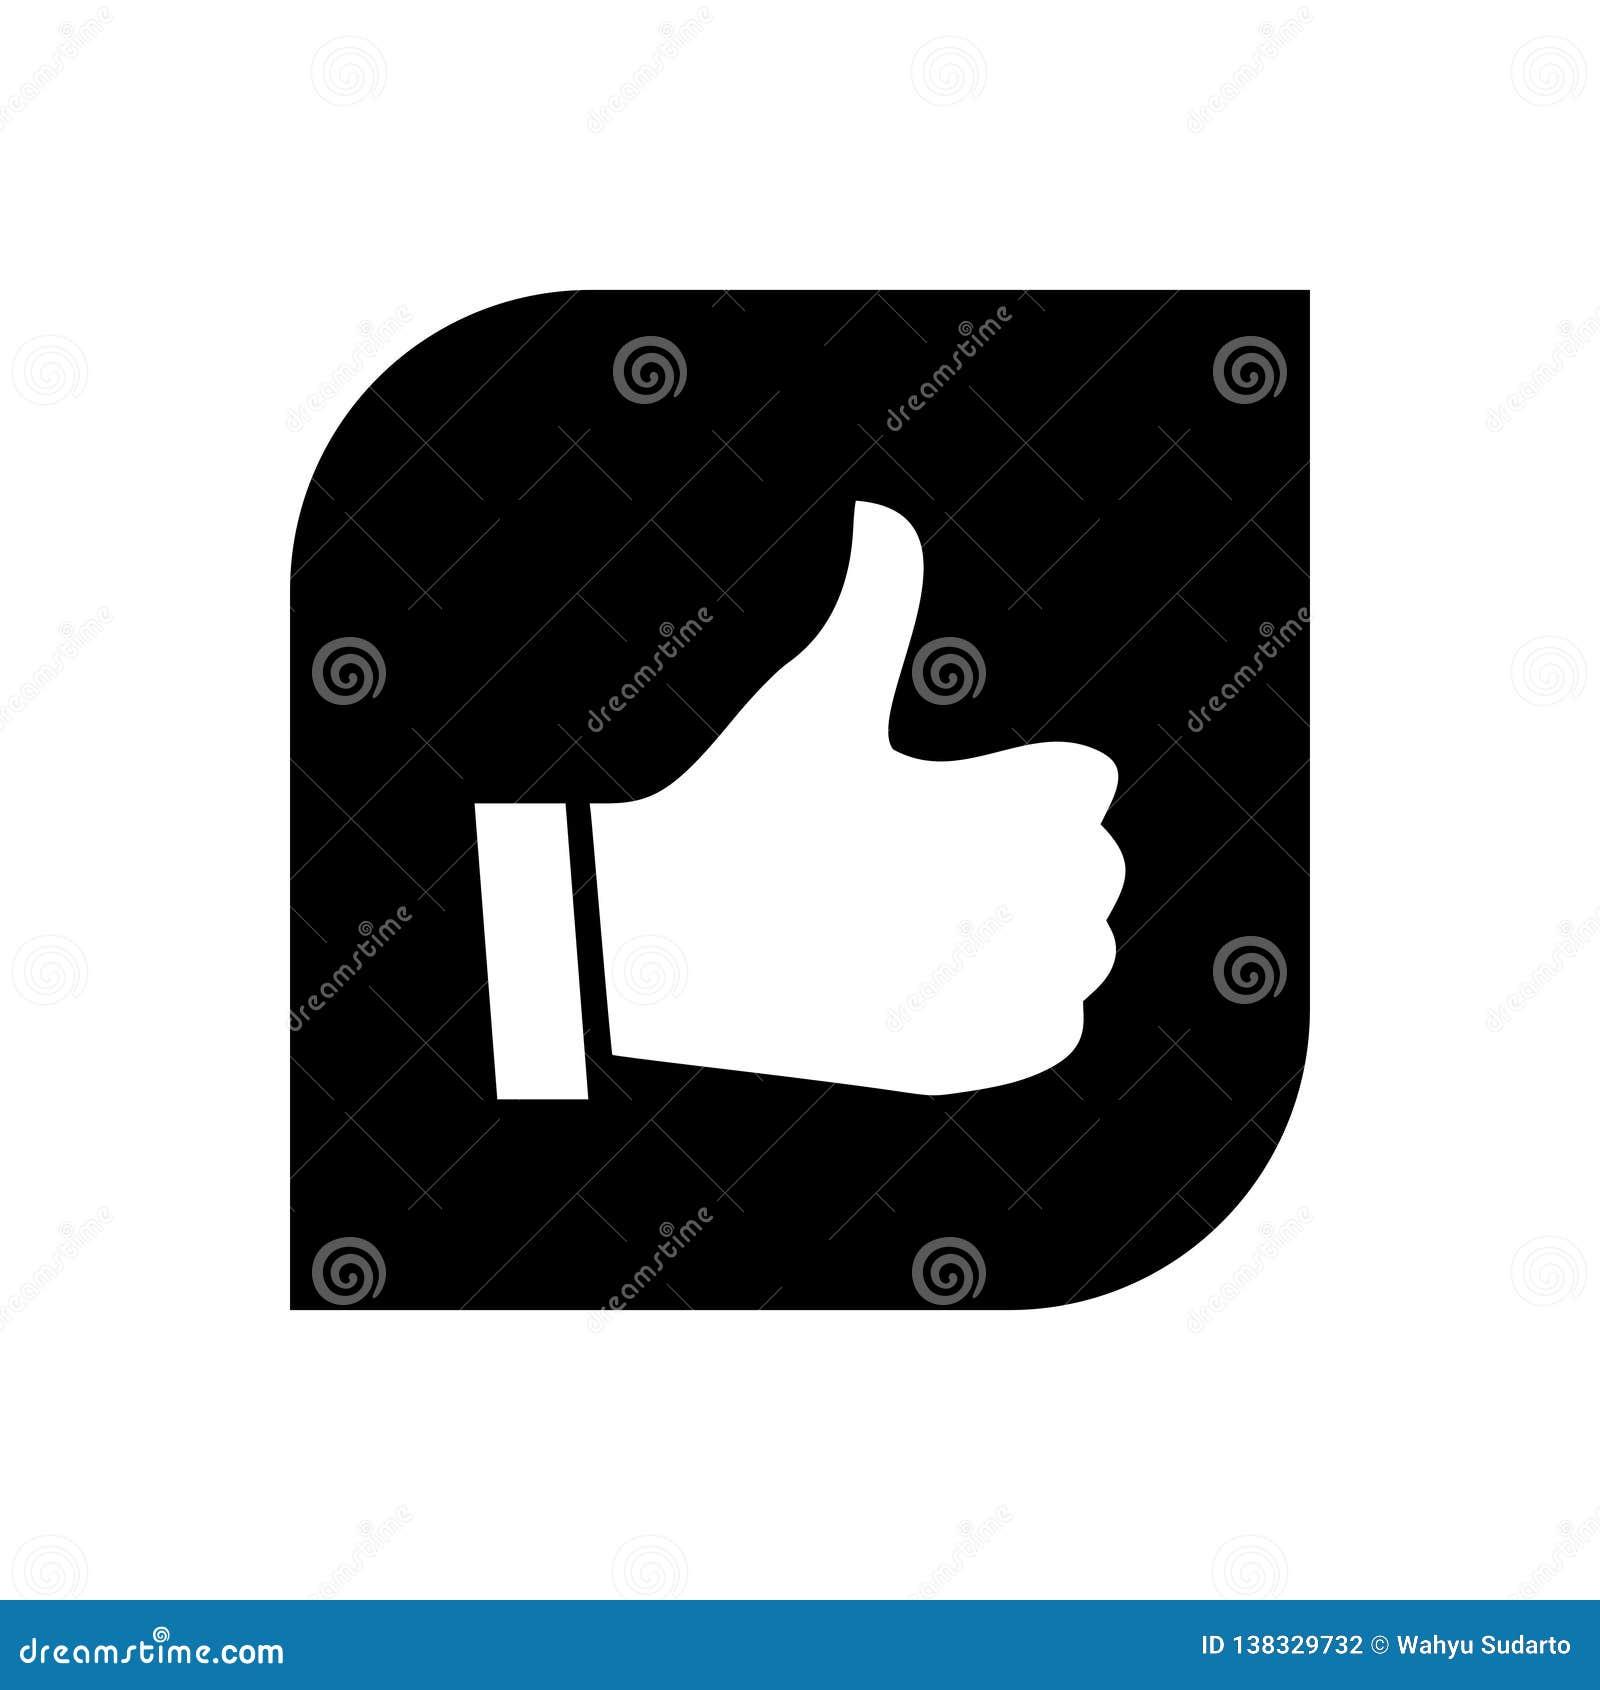 New thumb up icon